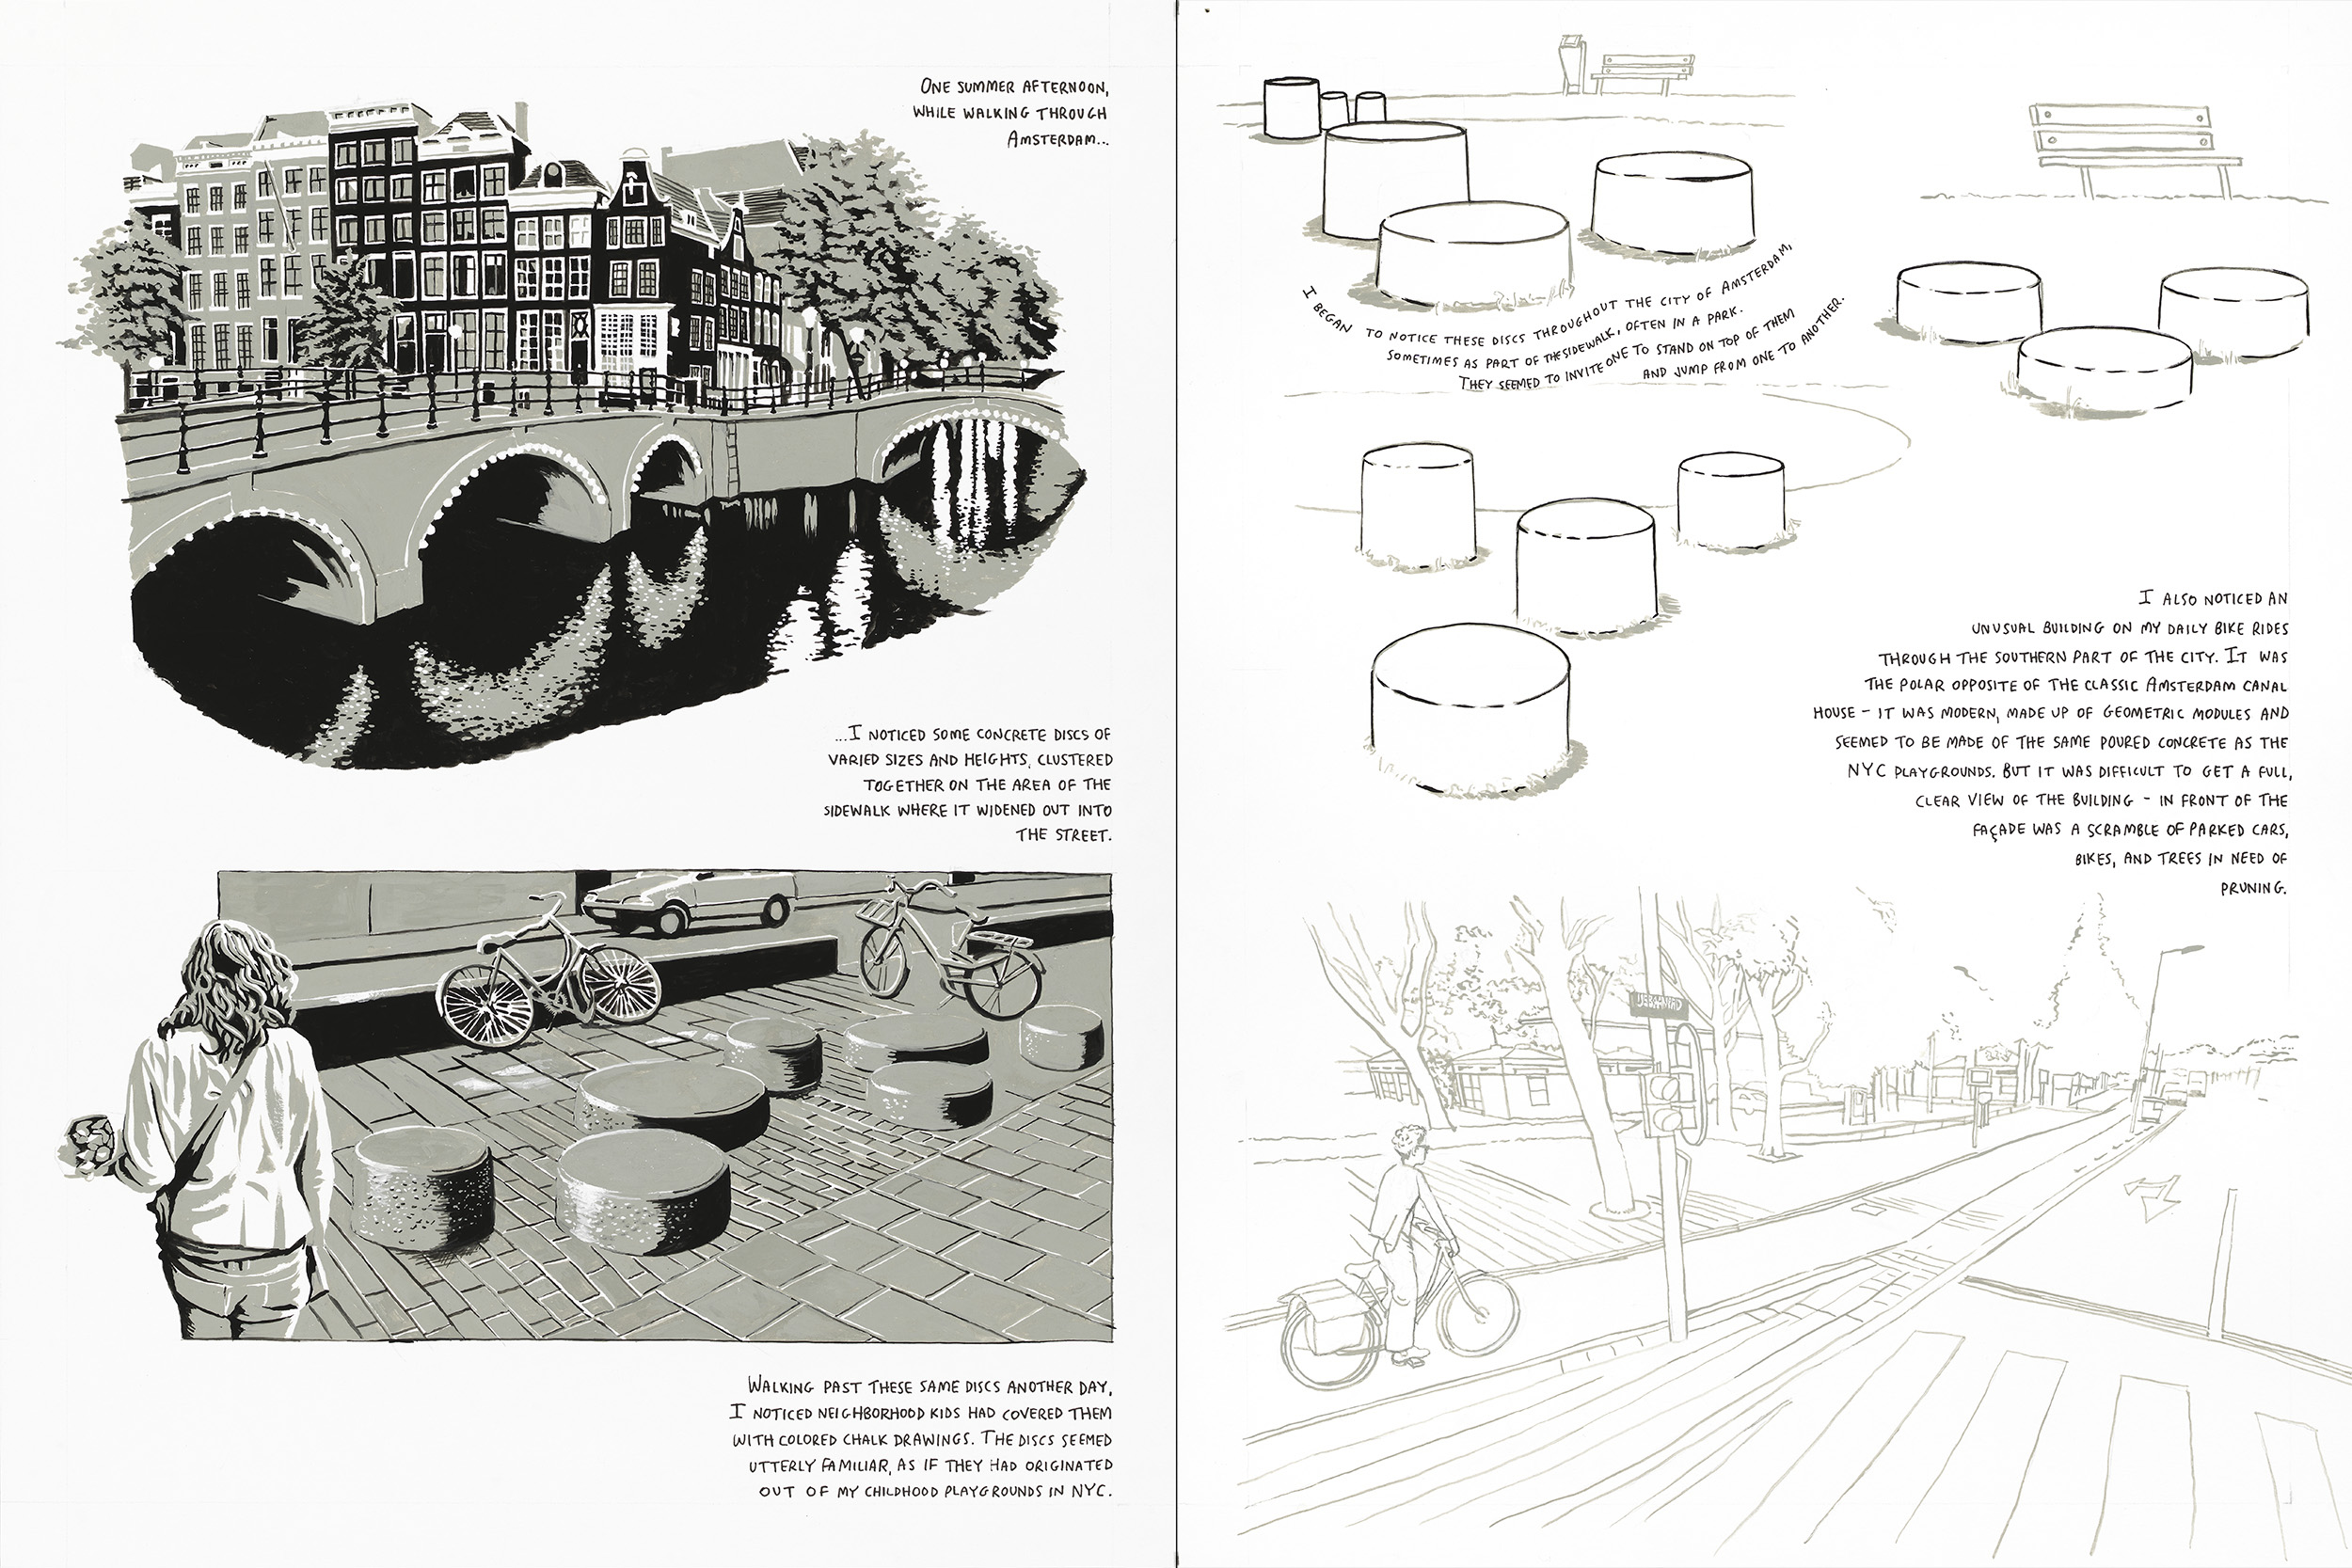 p24-25 v3.jpg